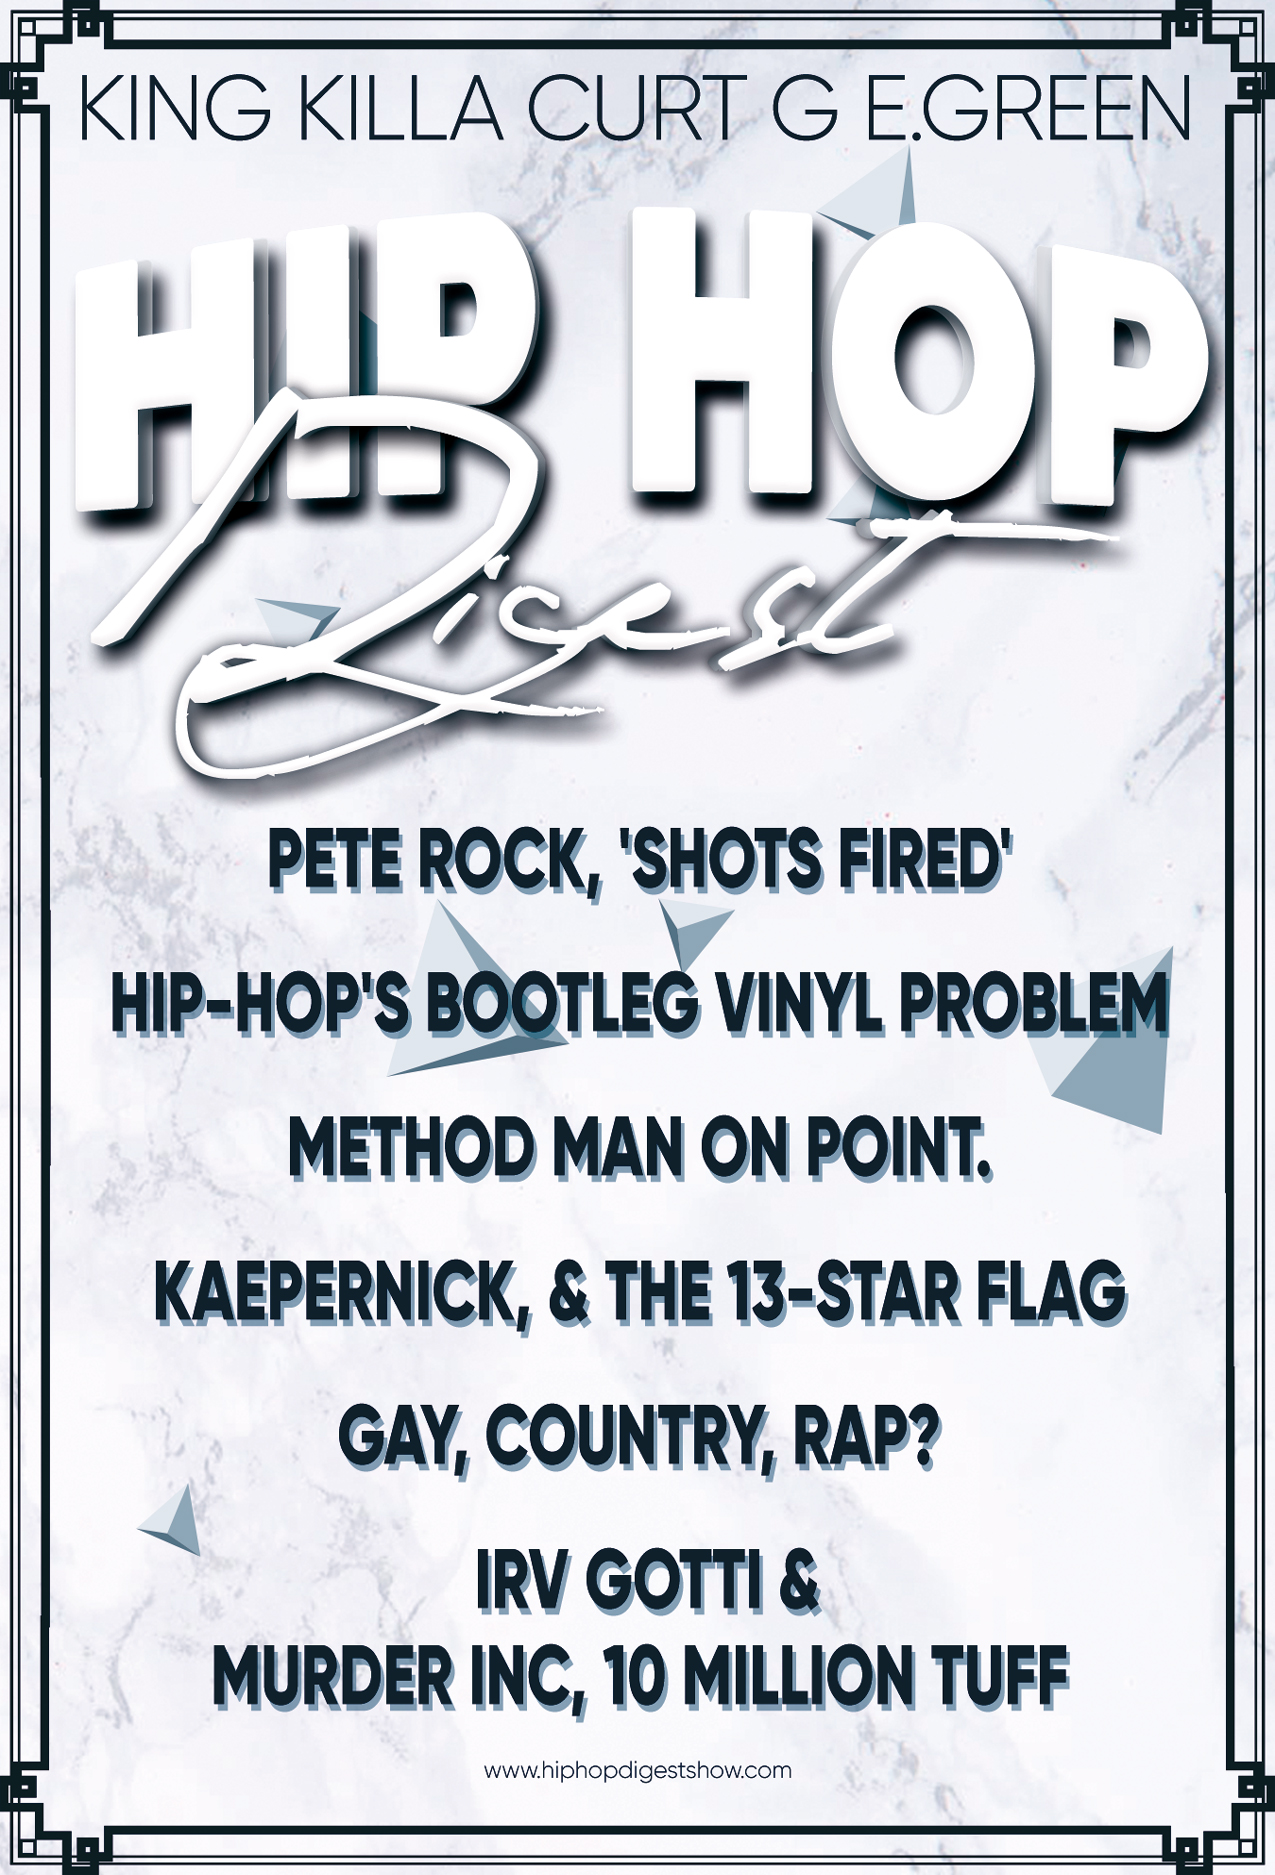 Hip-Hop Digest Show | Elders of Hip Hop  Never frontin' on the